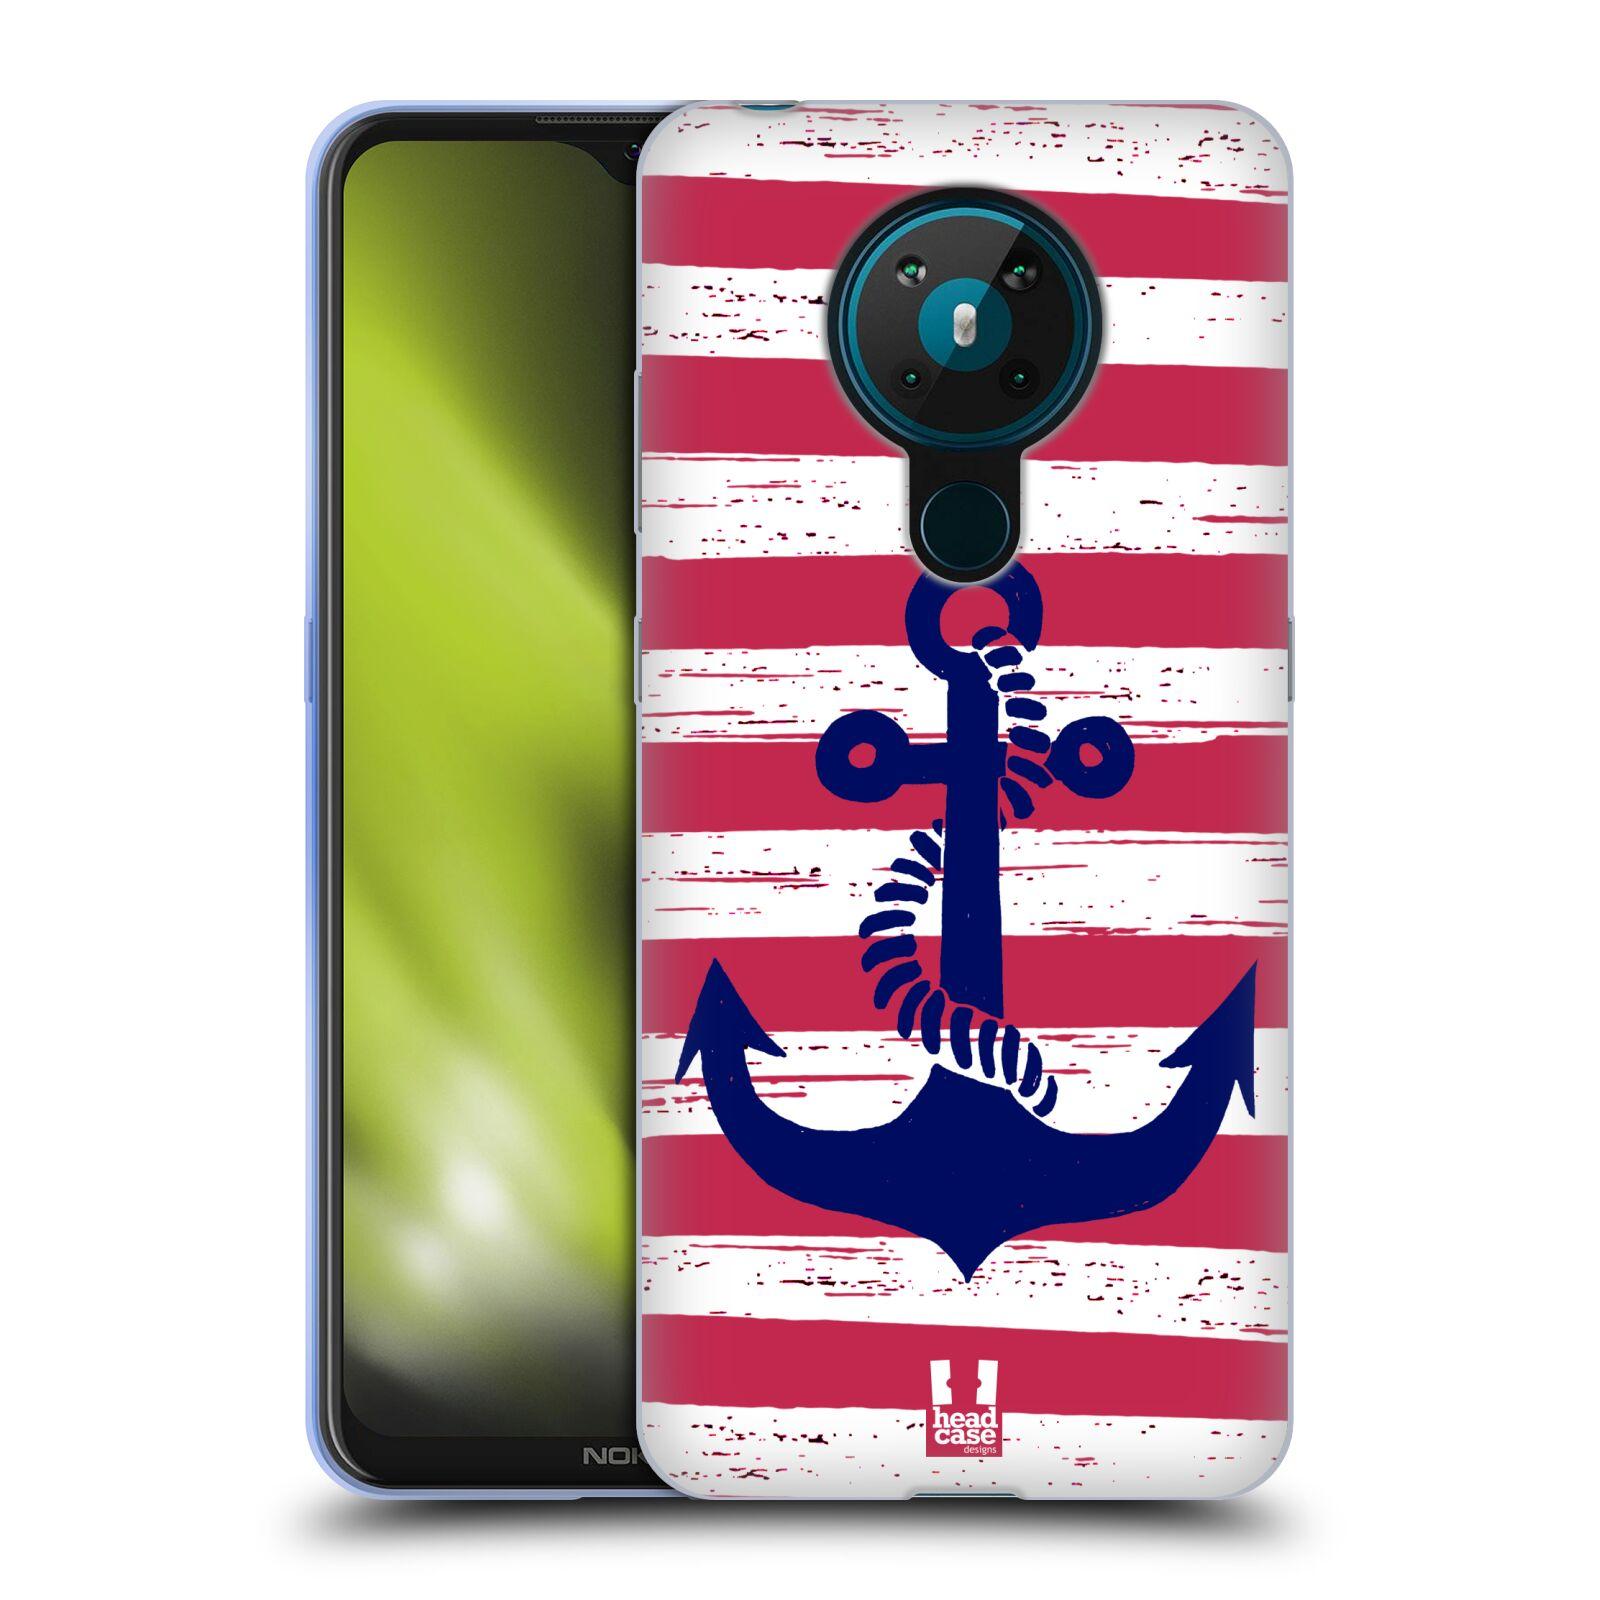 Silikonové pouzdro na mobil Nokia 5.3 - Head Case - KOTVA S PRUHY